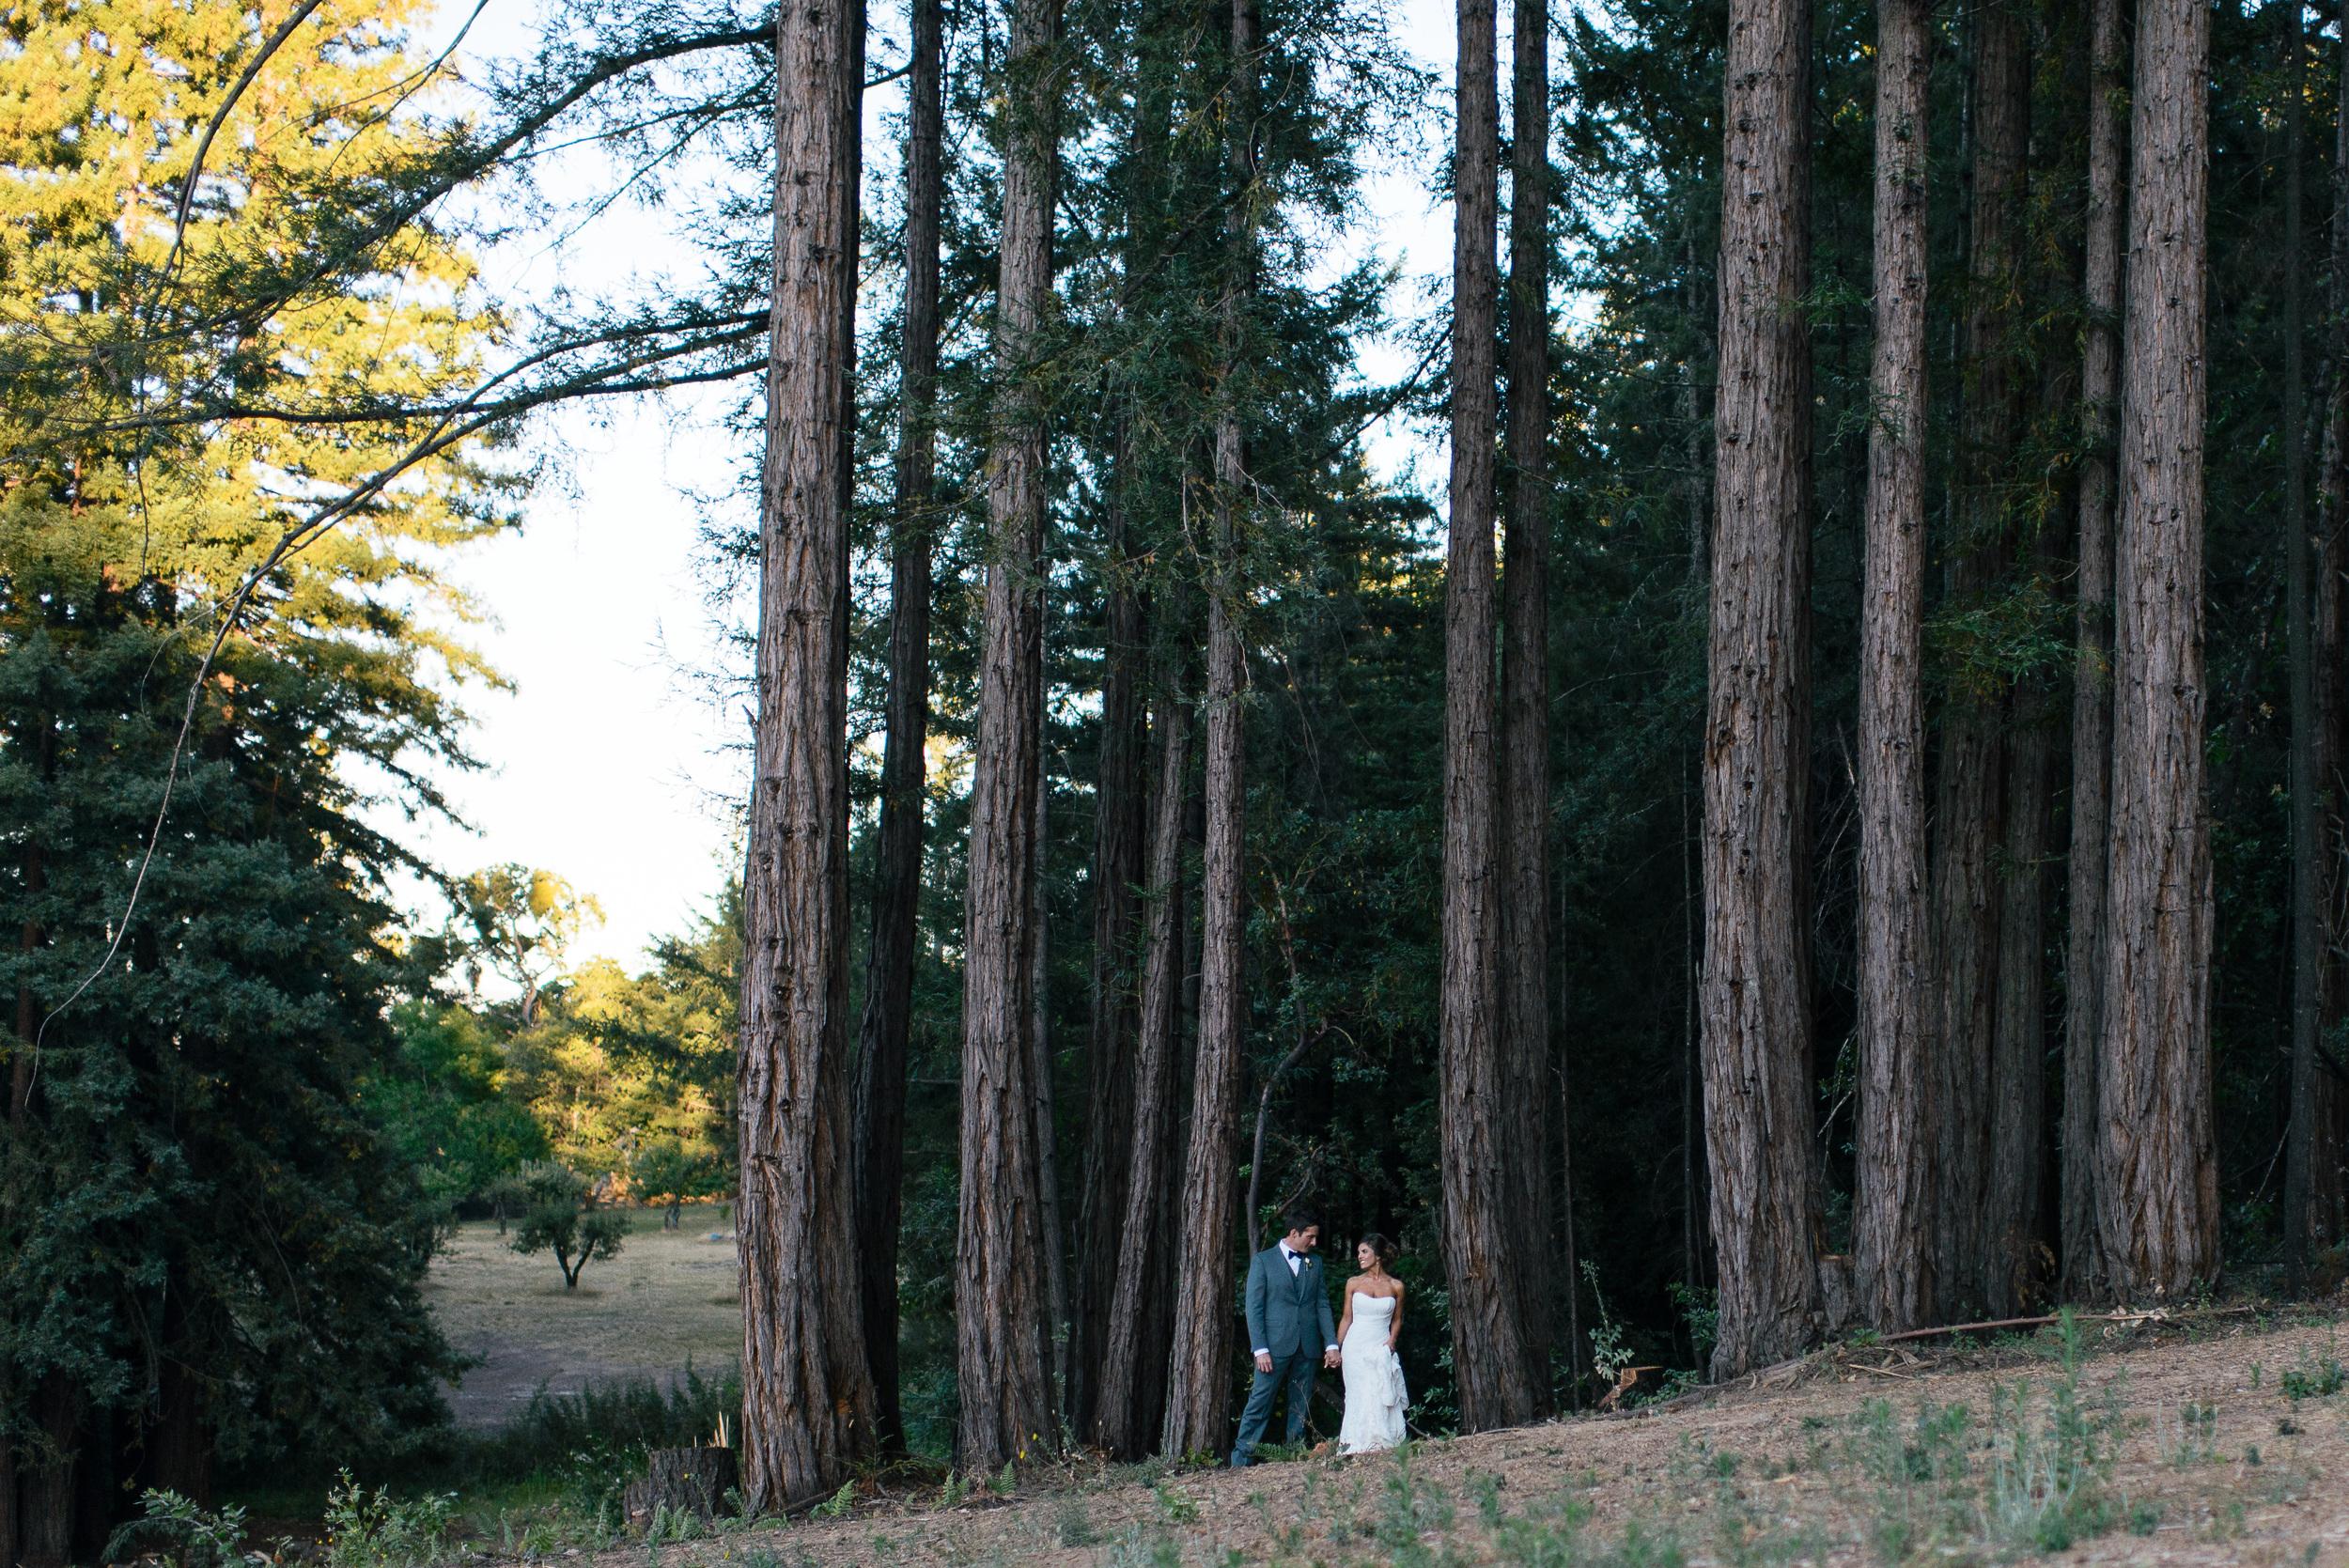 m-newsom-photography-chris-and-kim-napa-valley-wedding-savannah-georgia-wedding-photographer (943 of 1586).jpg